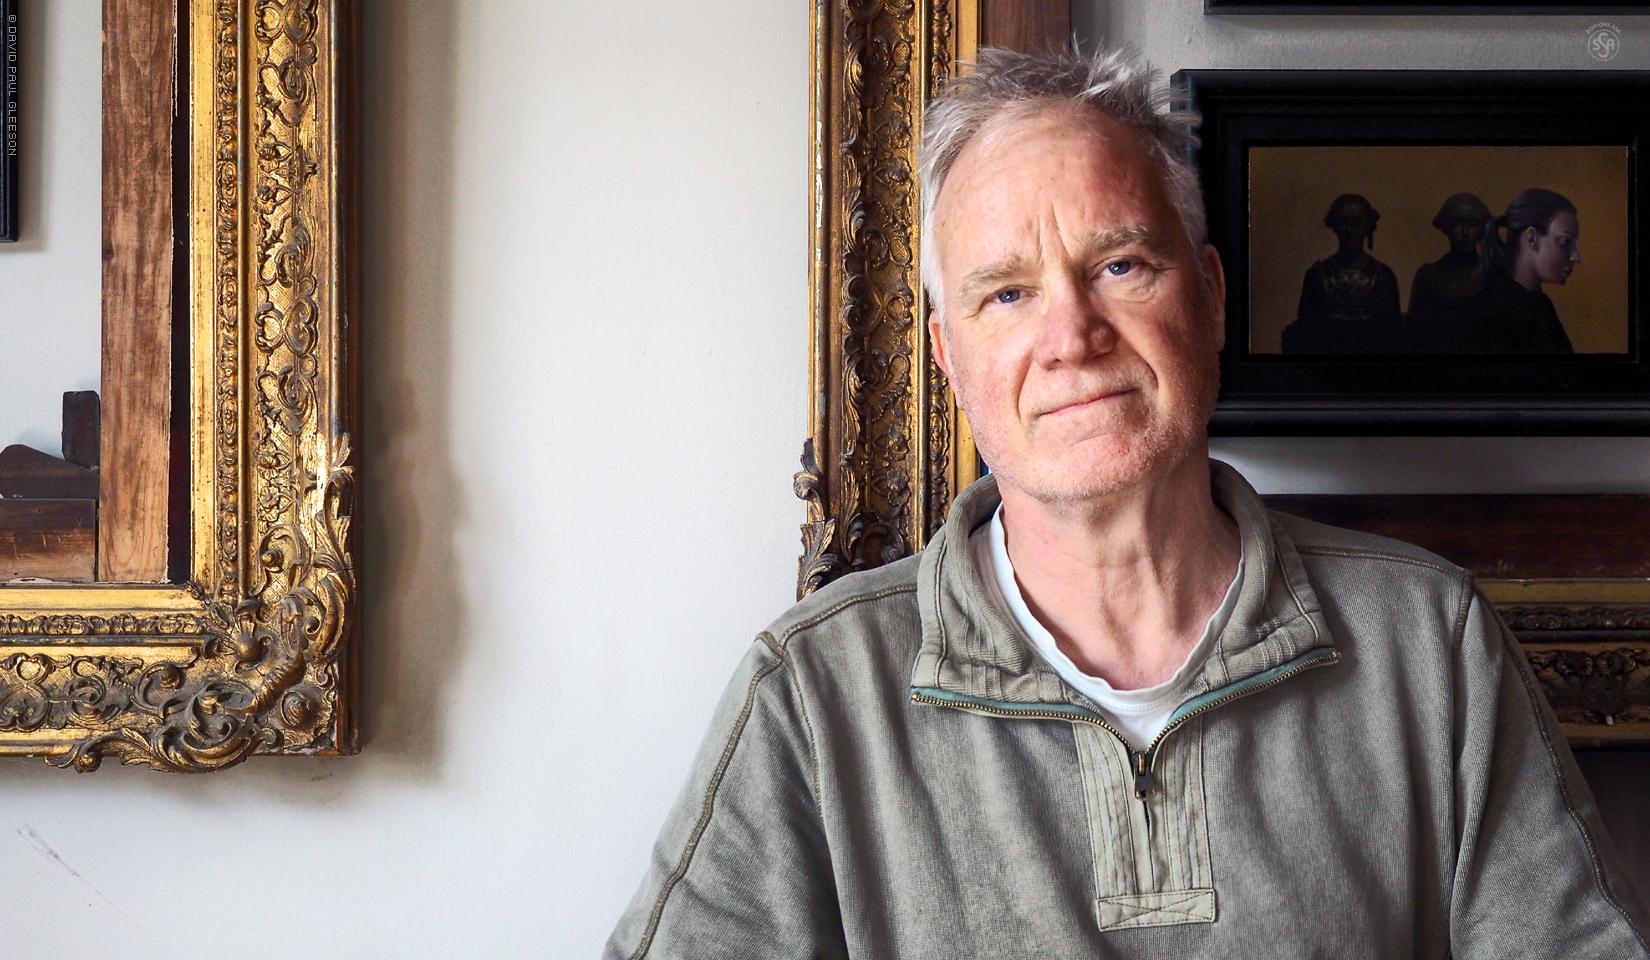 David Paul Gleeson